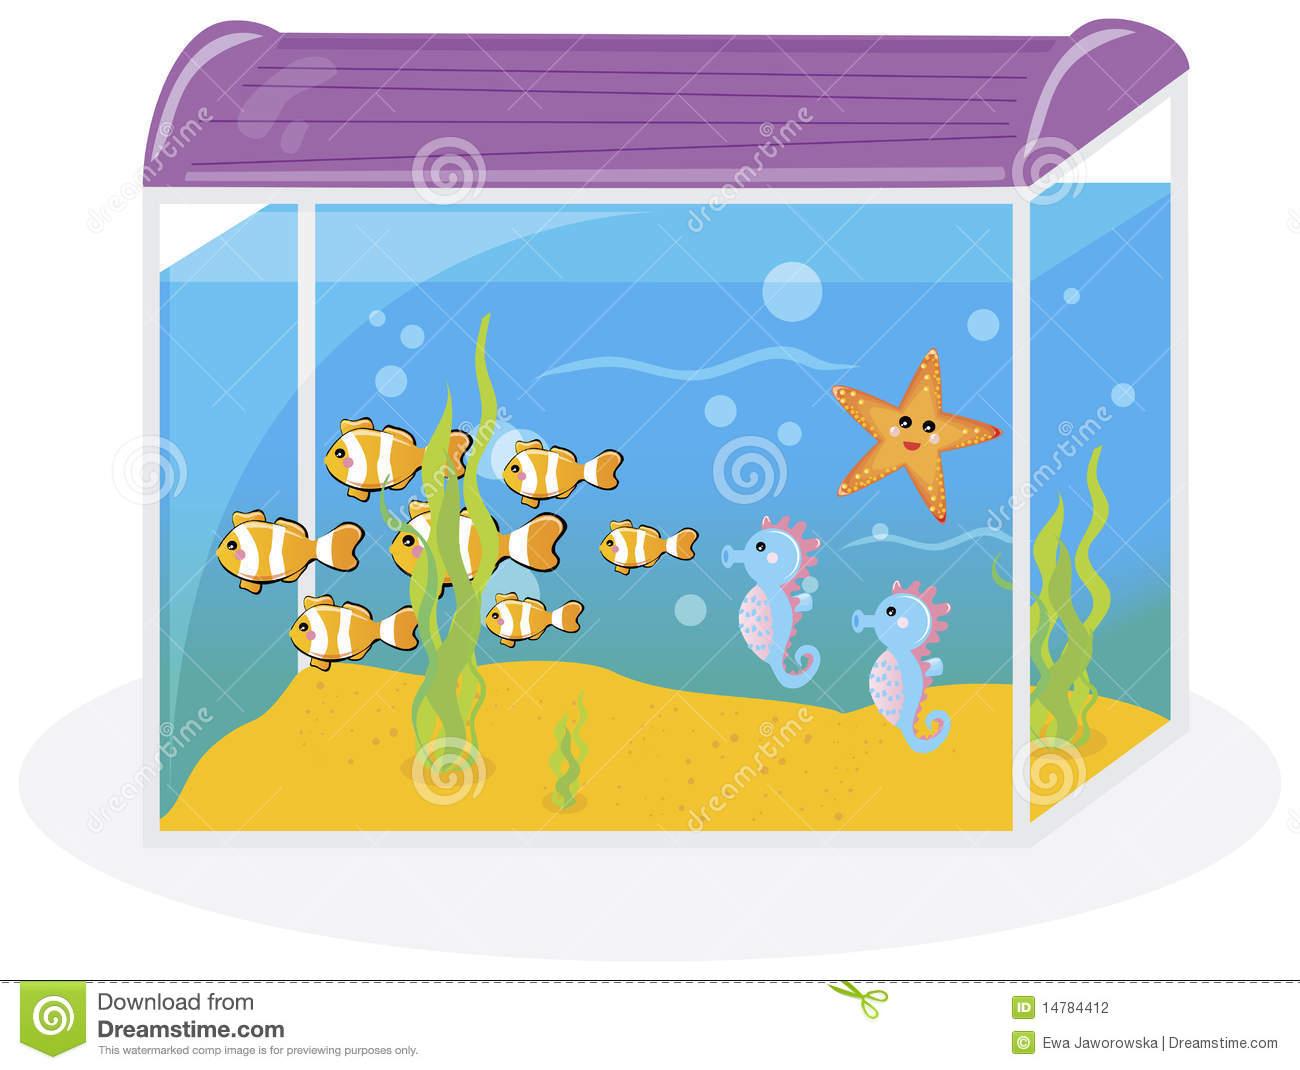 Aquarium fish images clipart png transparent library 76+ Aquarium Clip Art | ClipartLook png transparent library